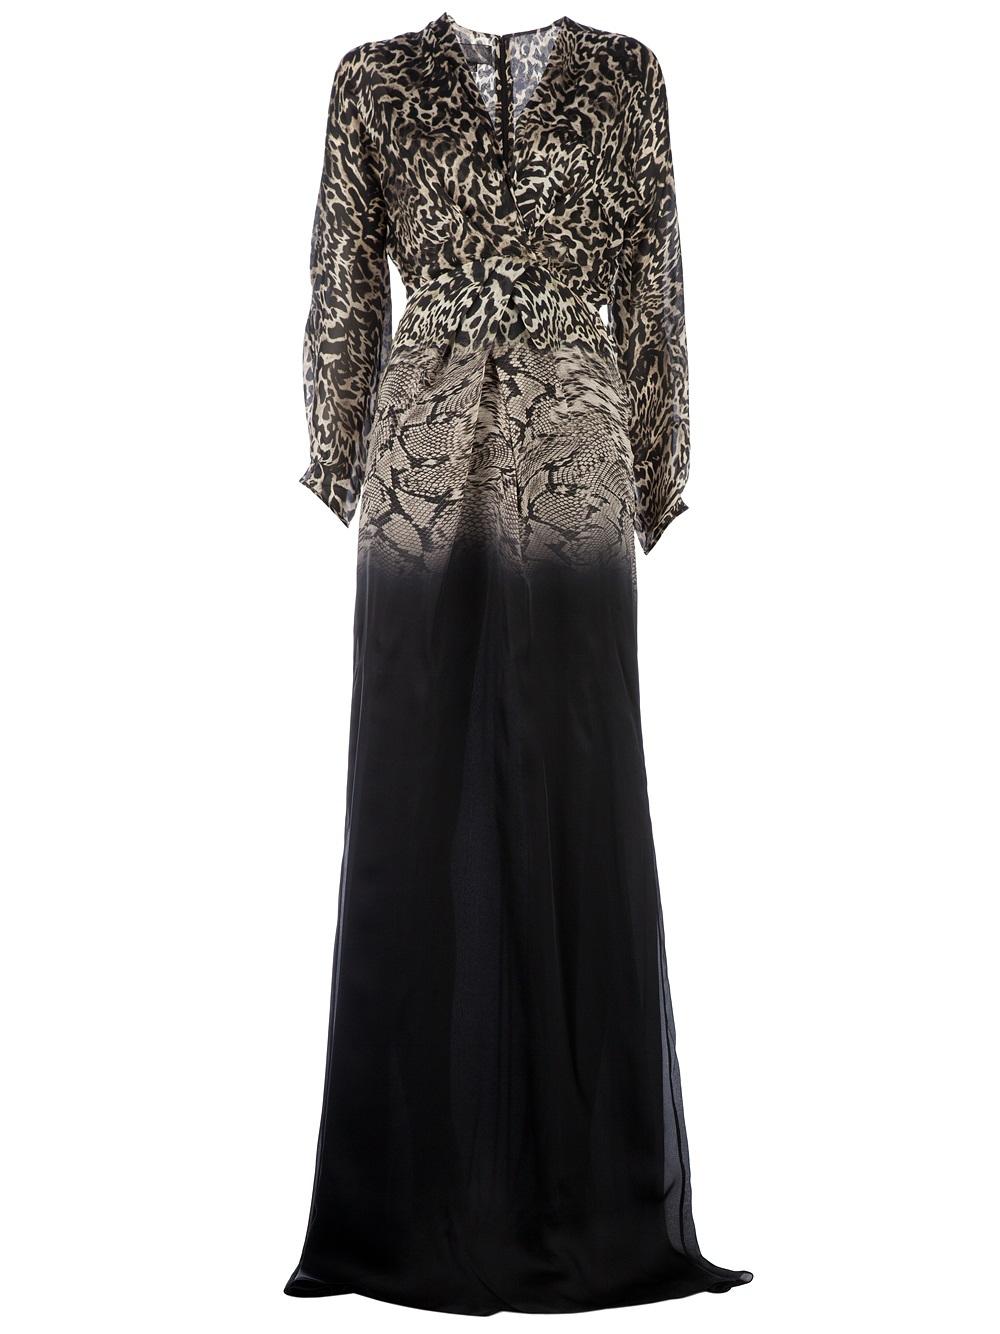 145b238bd3 Lyst - Giambattista Valli Animal Print Gown in Black